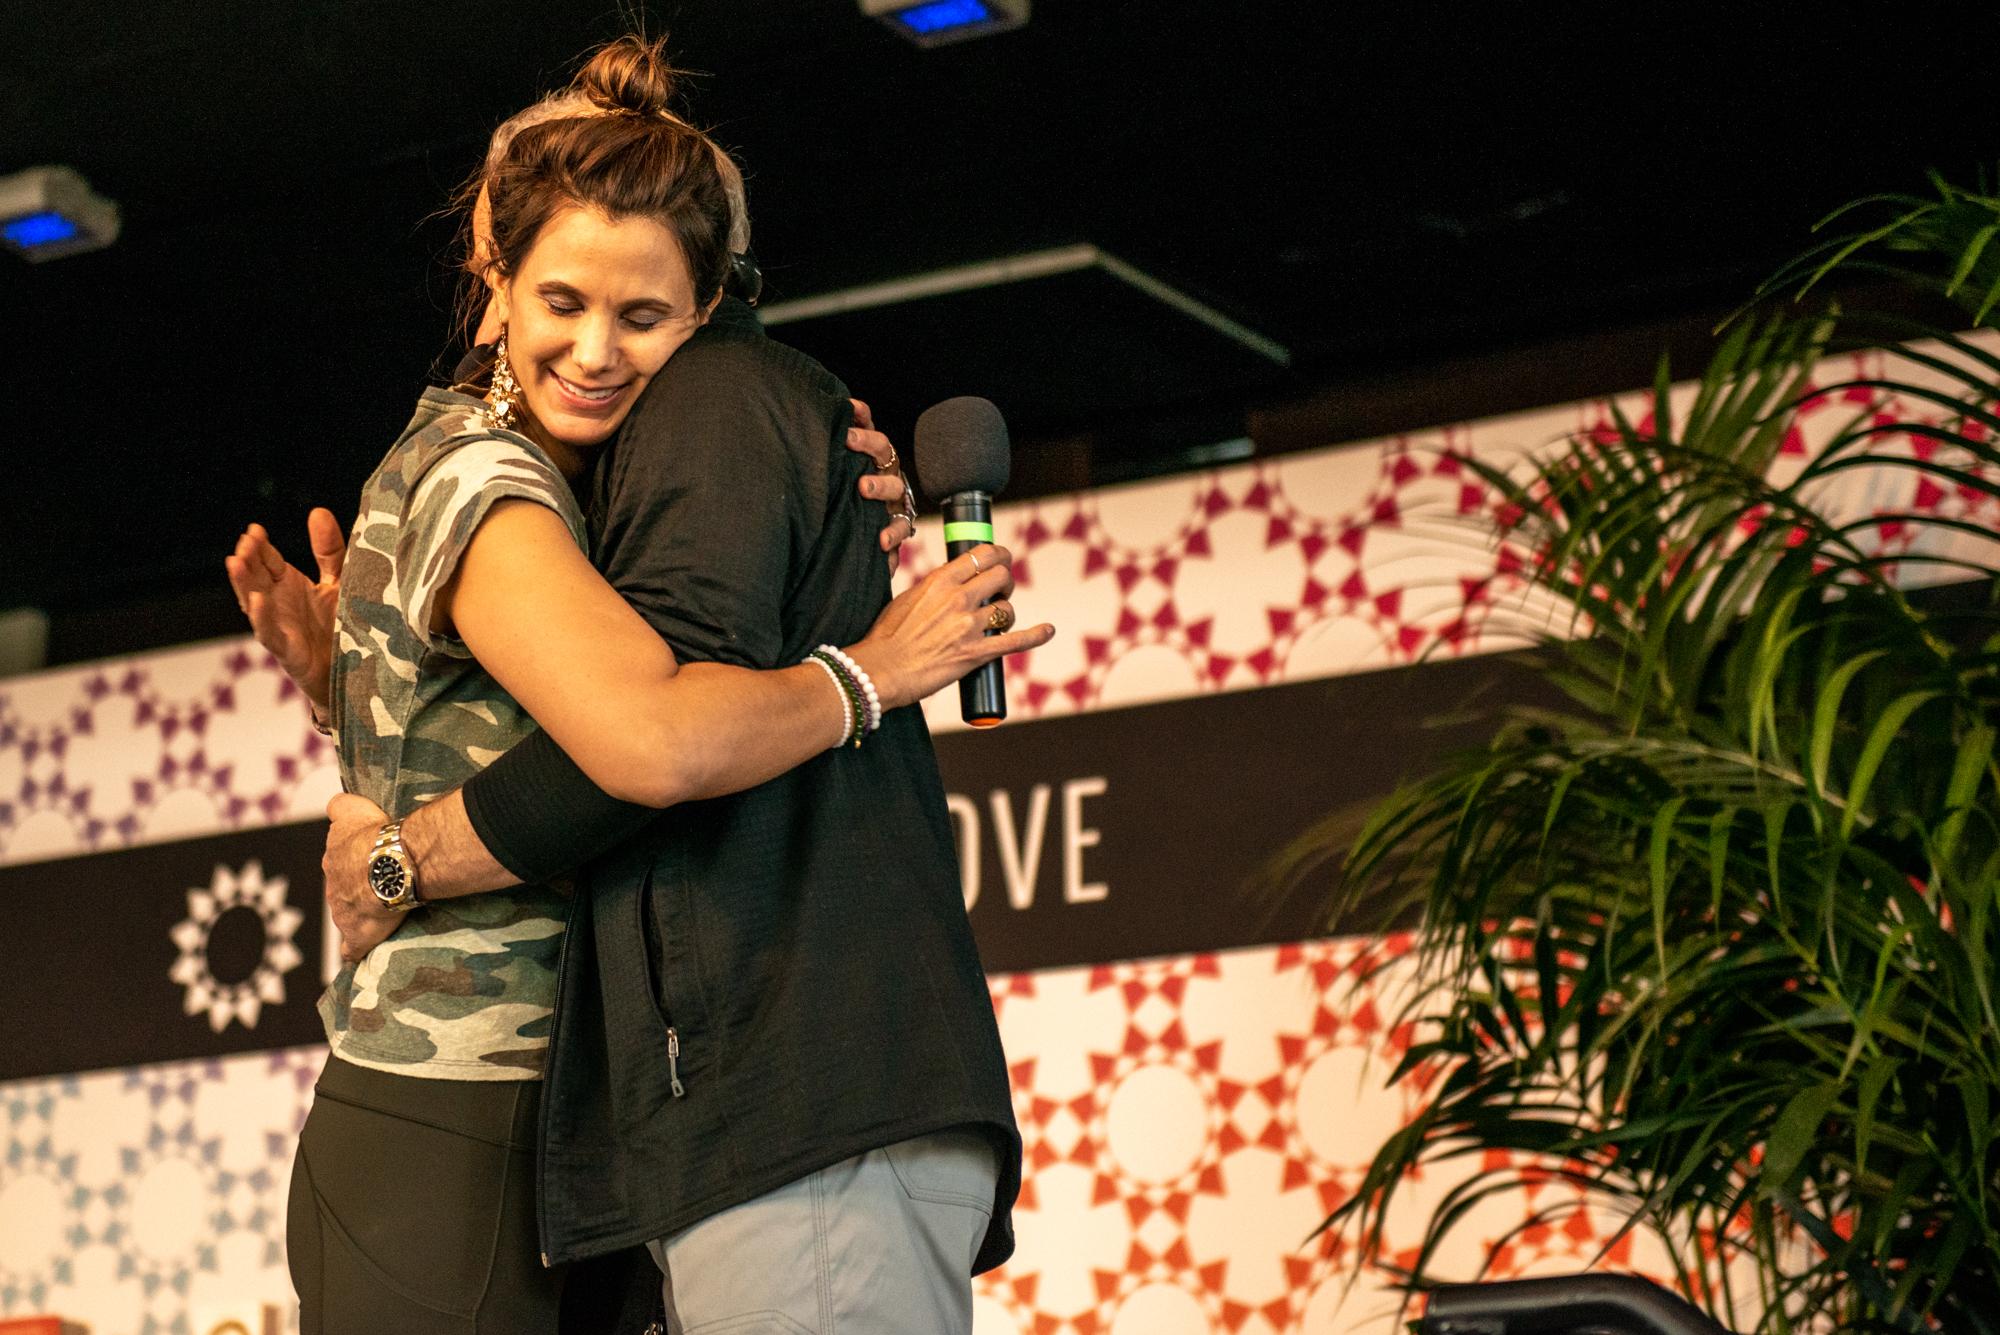 Gina Murdock Hug